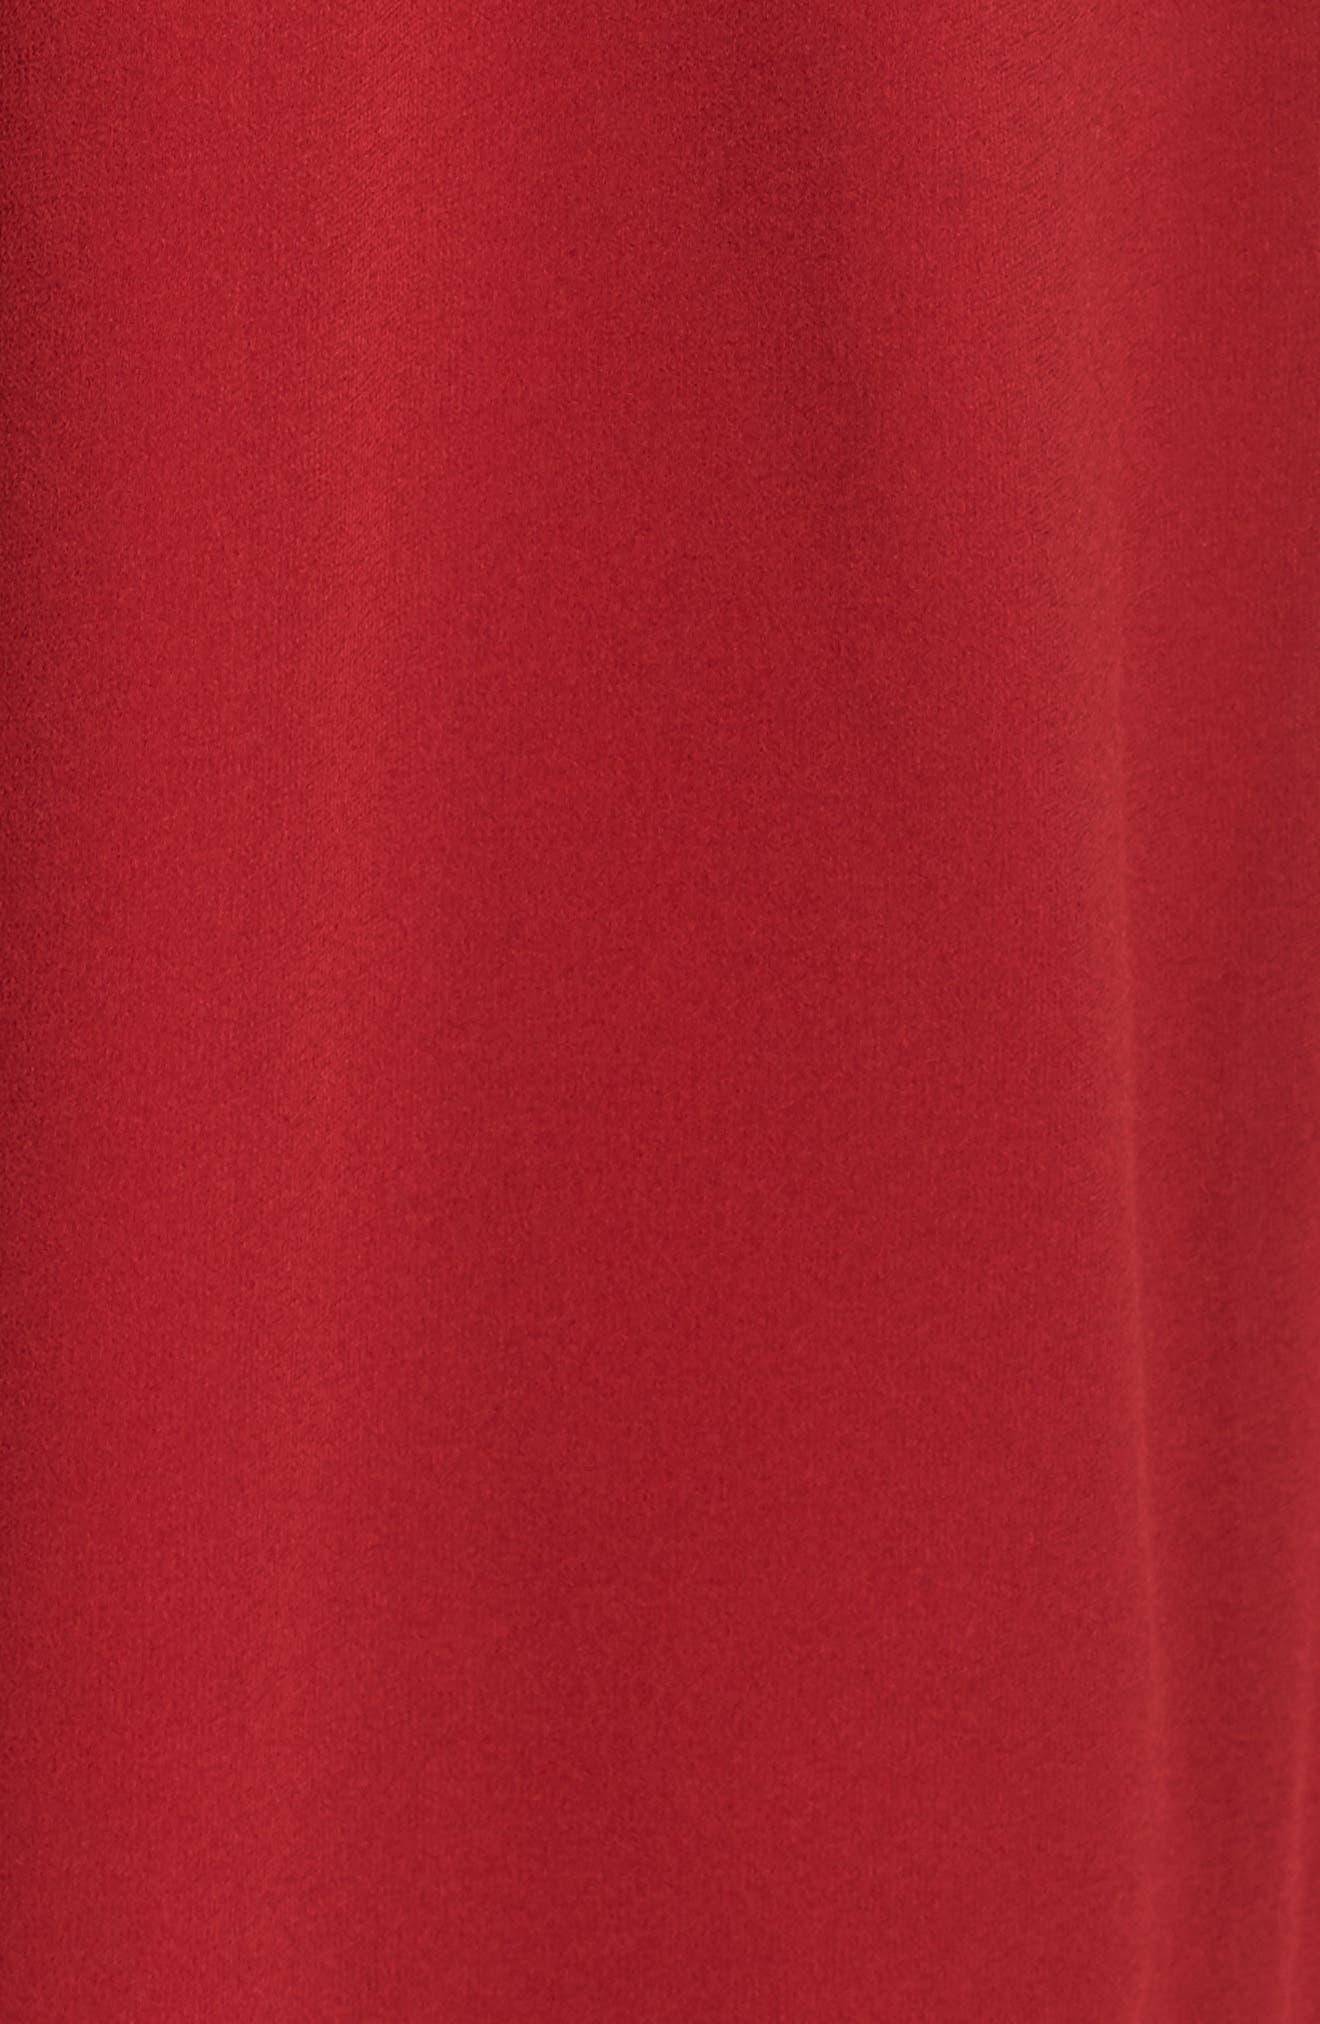 Ruffle Midi Dress,                             Alternate thumbnail 6, color,                             Red Jester